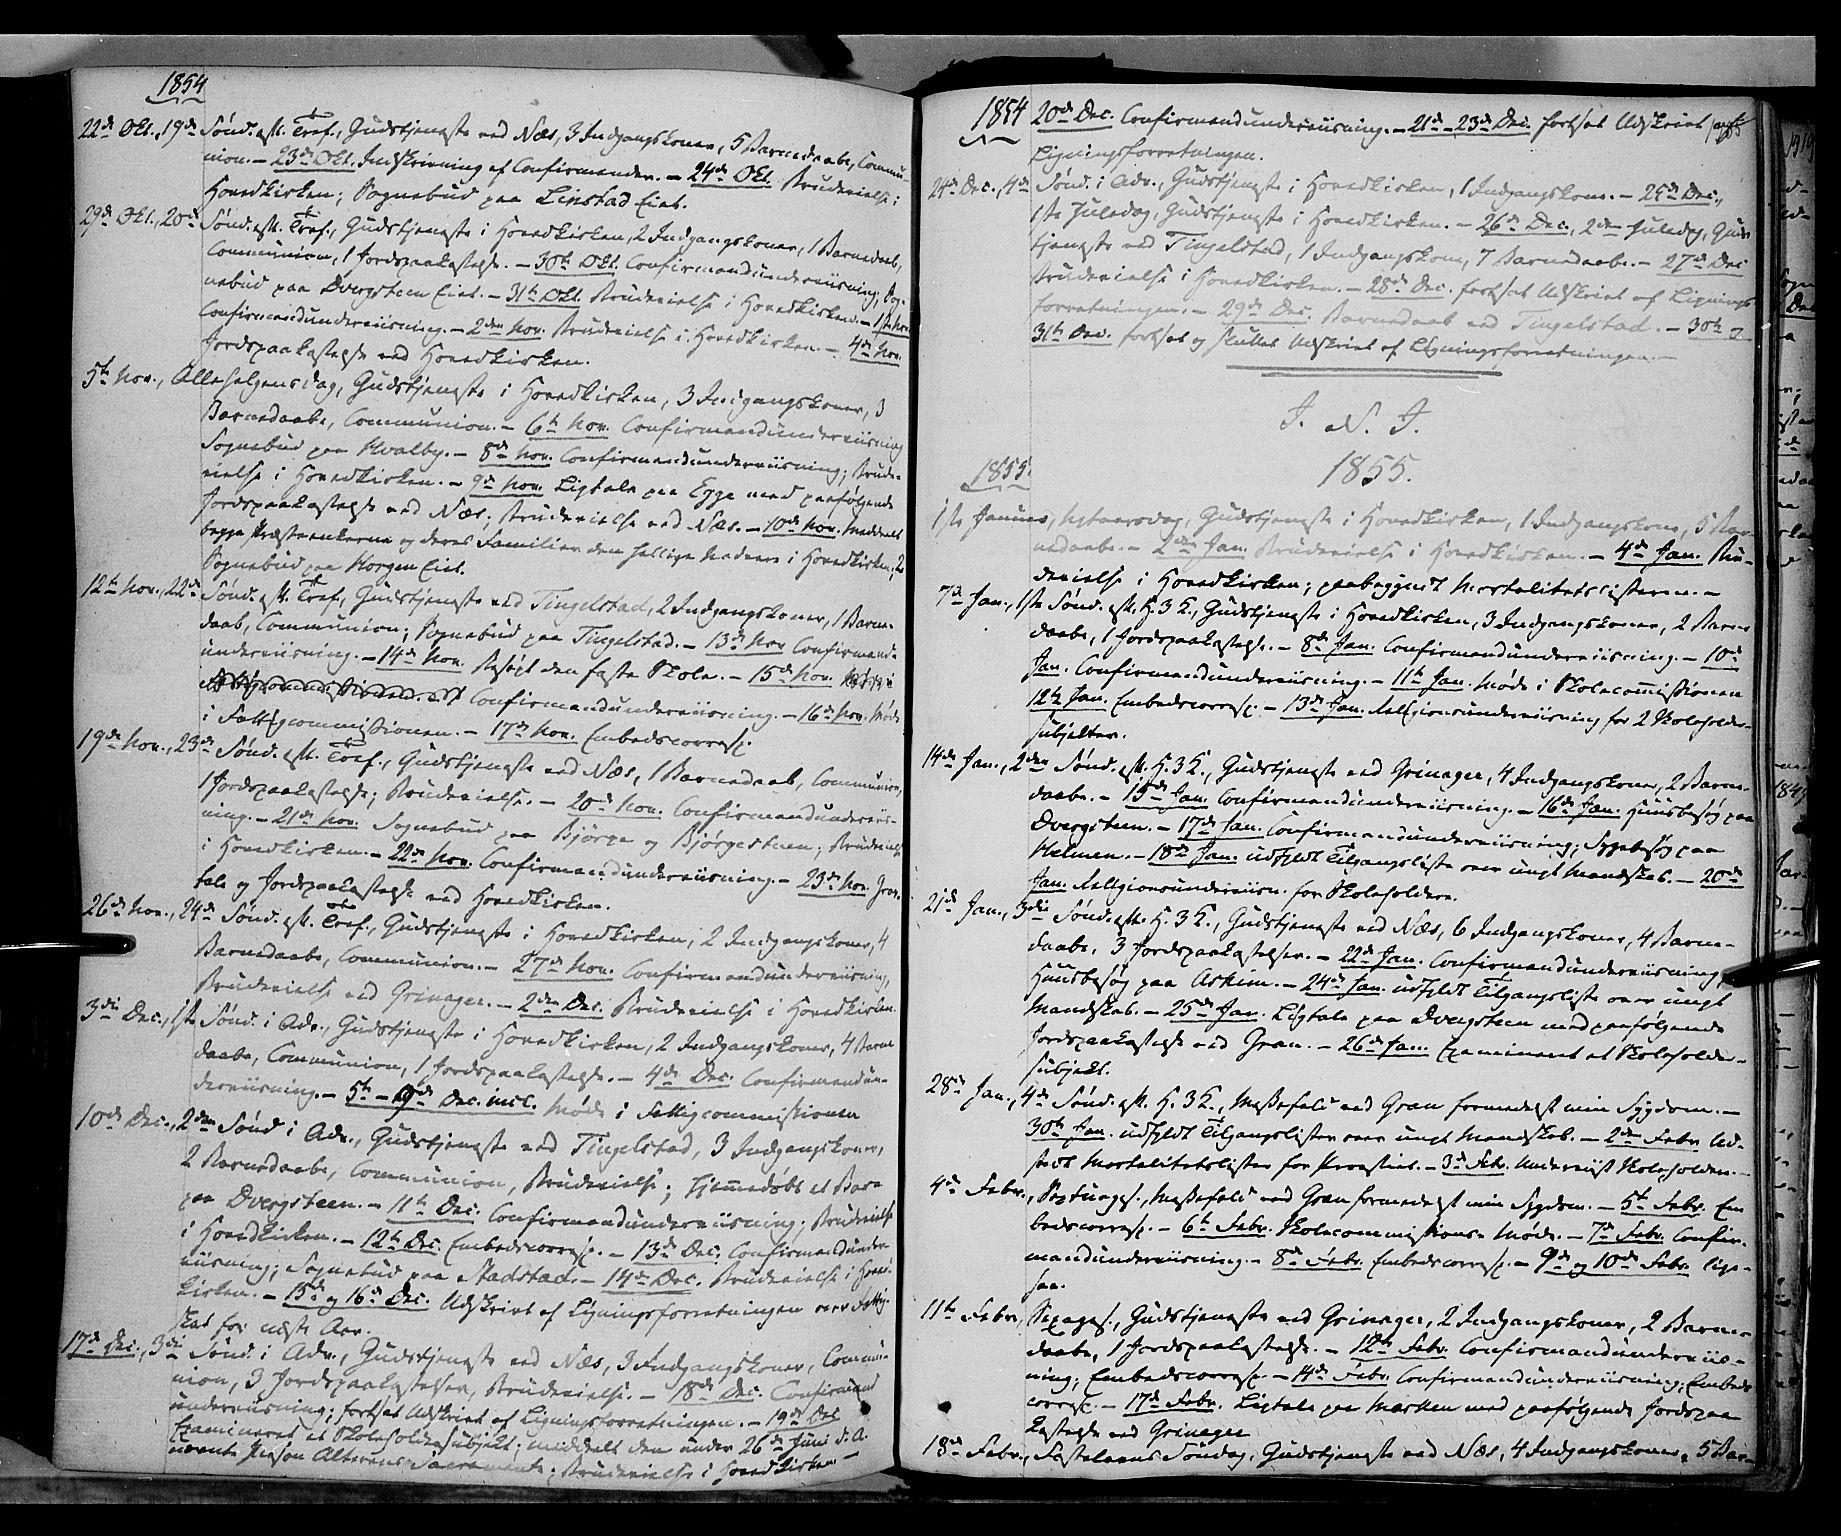 SAH, Gran prestekontor, Ministerialbok nr. 11, 1842-1856, s. 1384-1385